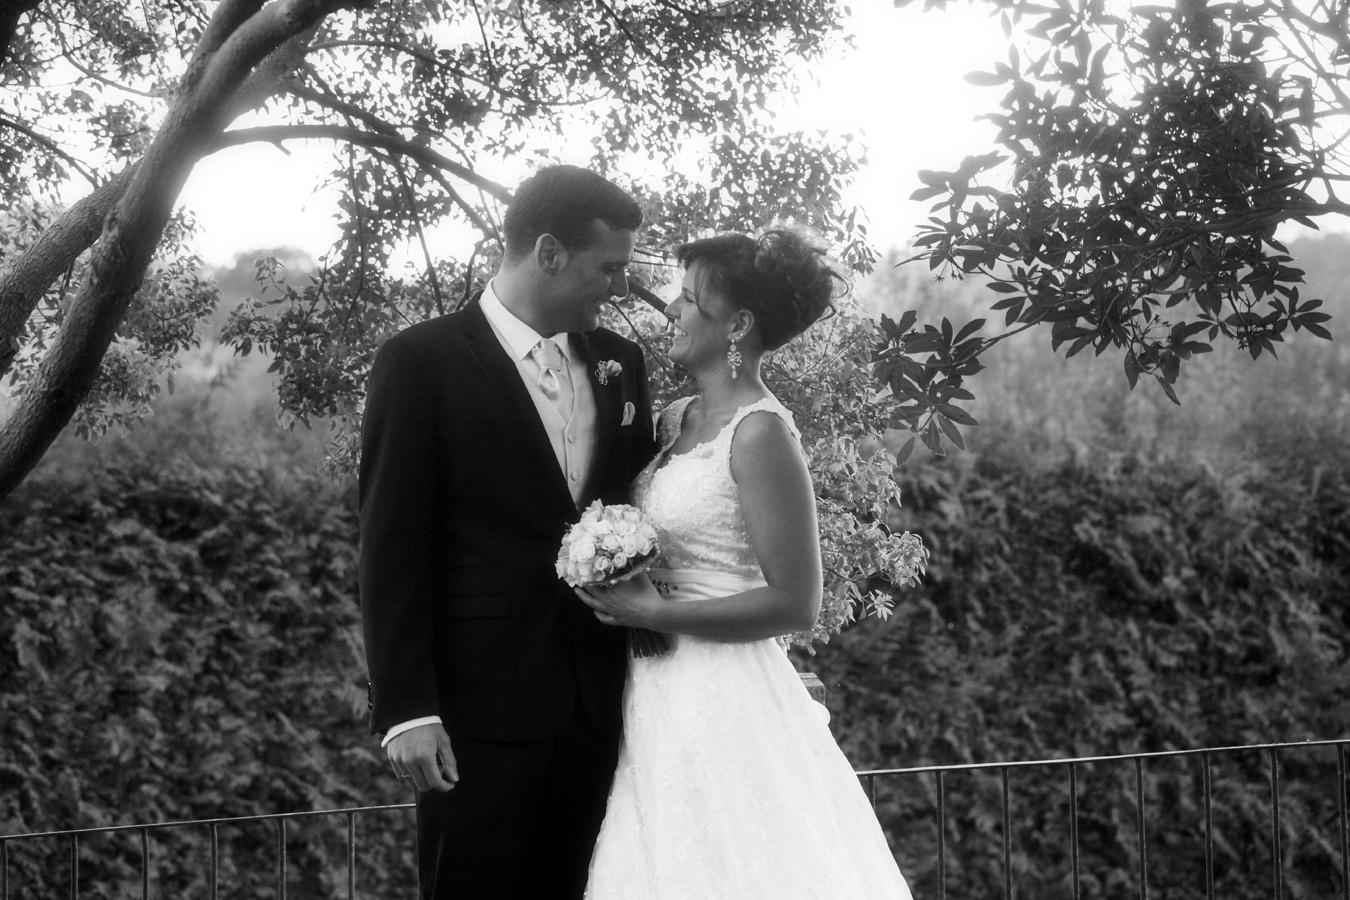 boda-pazo-toxeiriña-ceremonia-civil-alessandro-diana-cambados-vilagarcia-playa-post-boda018